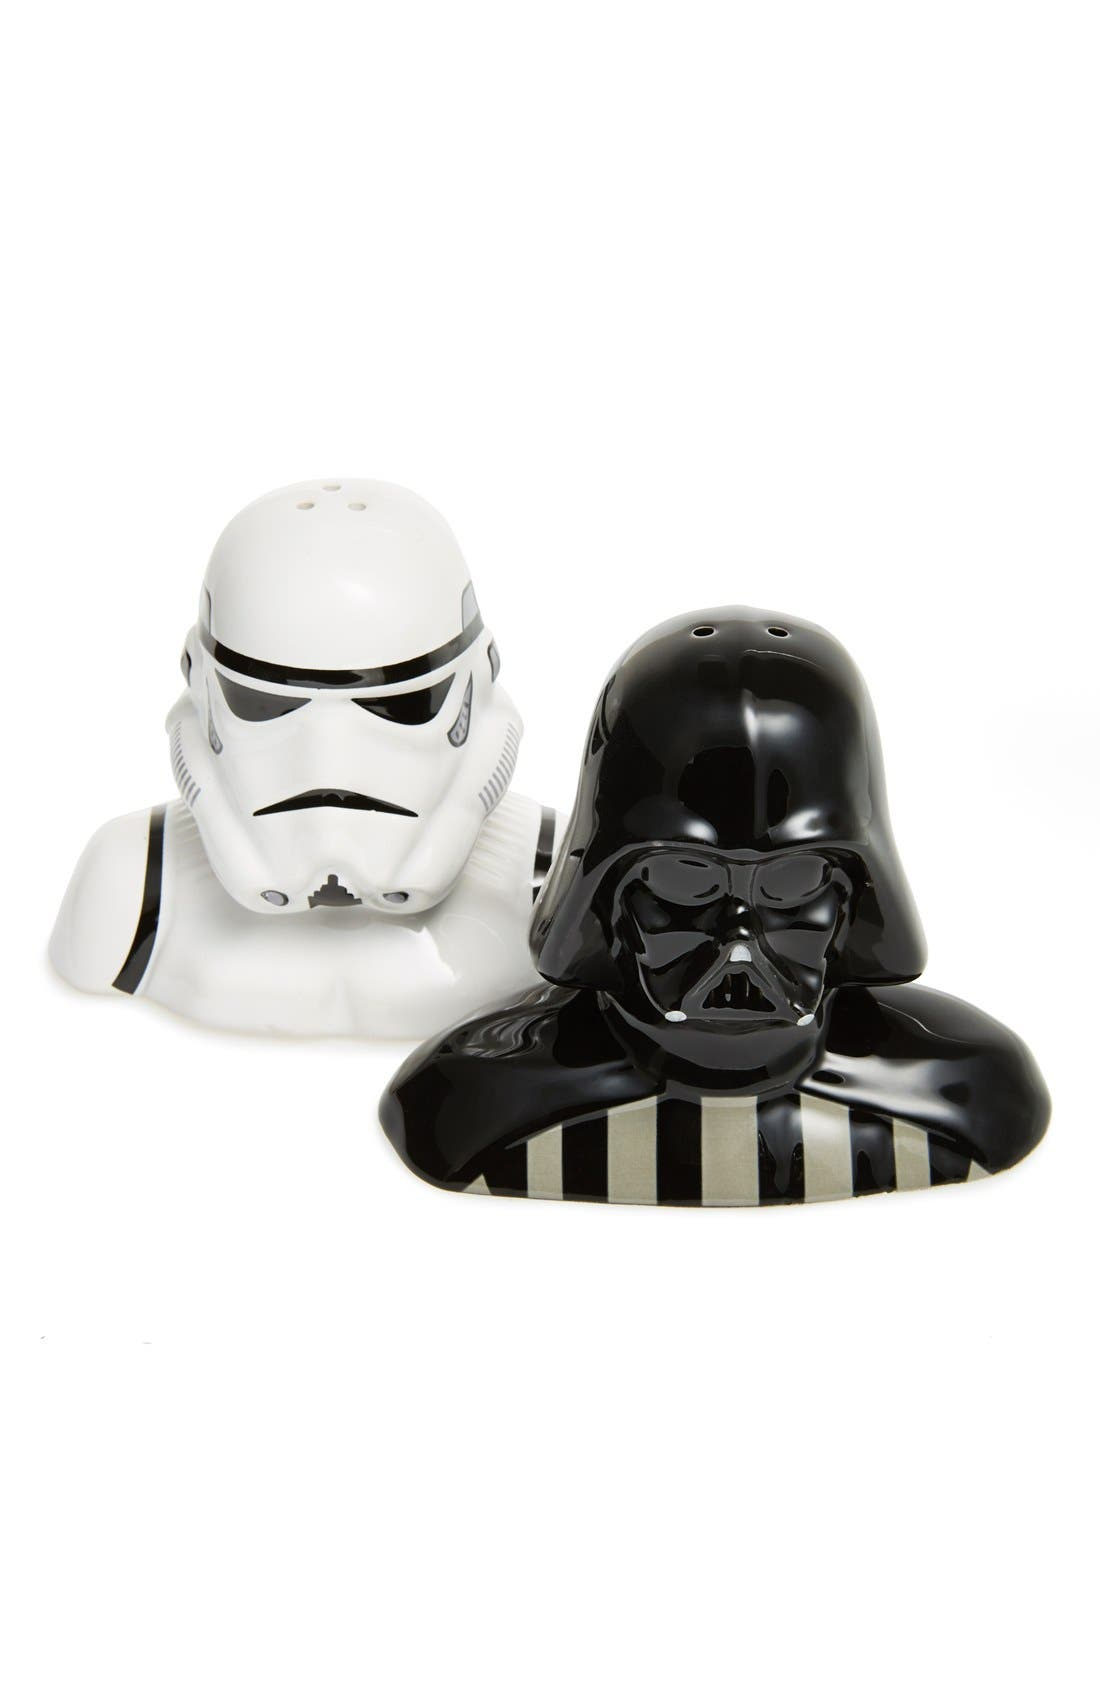 Alternate Image 1 Selected - Vandor Star Wars Salt & Pepper Shakers